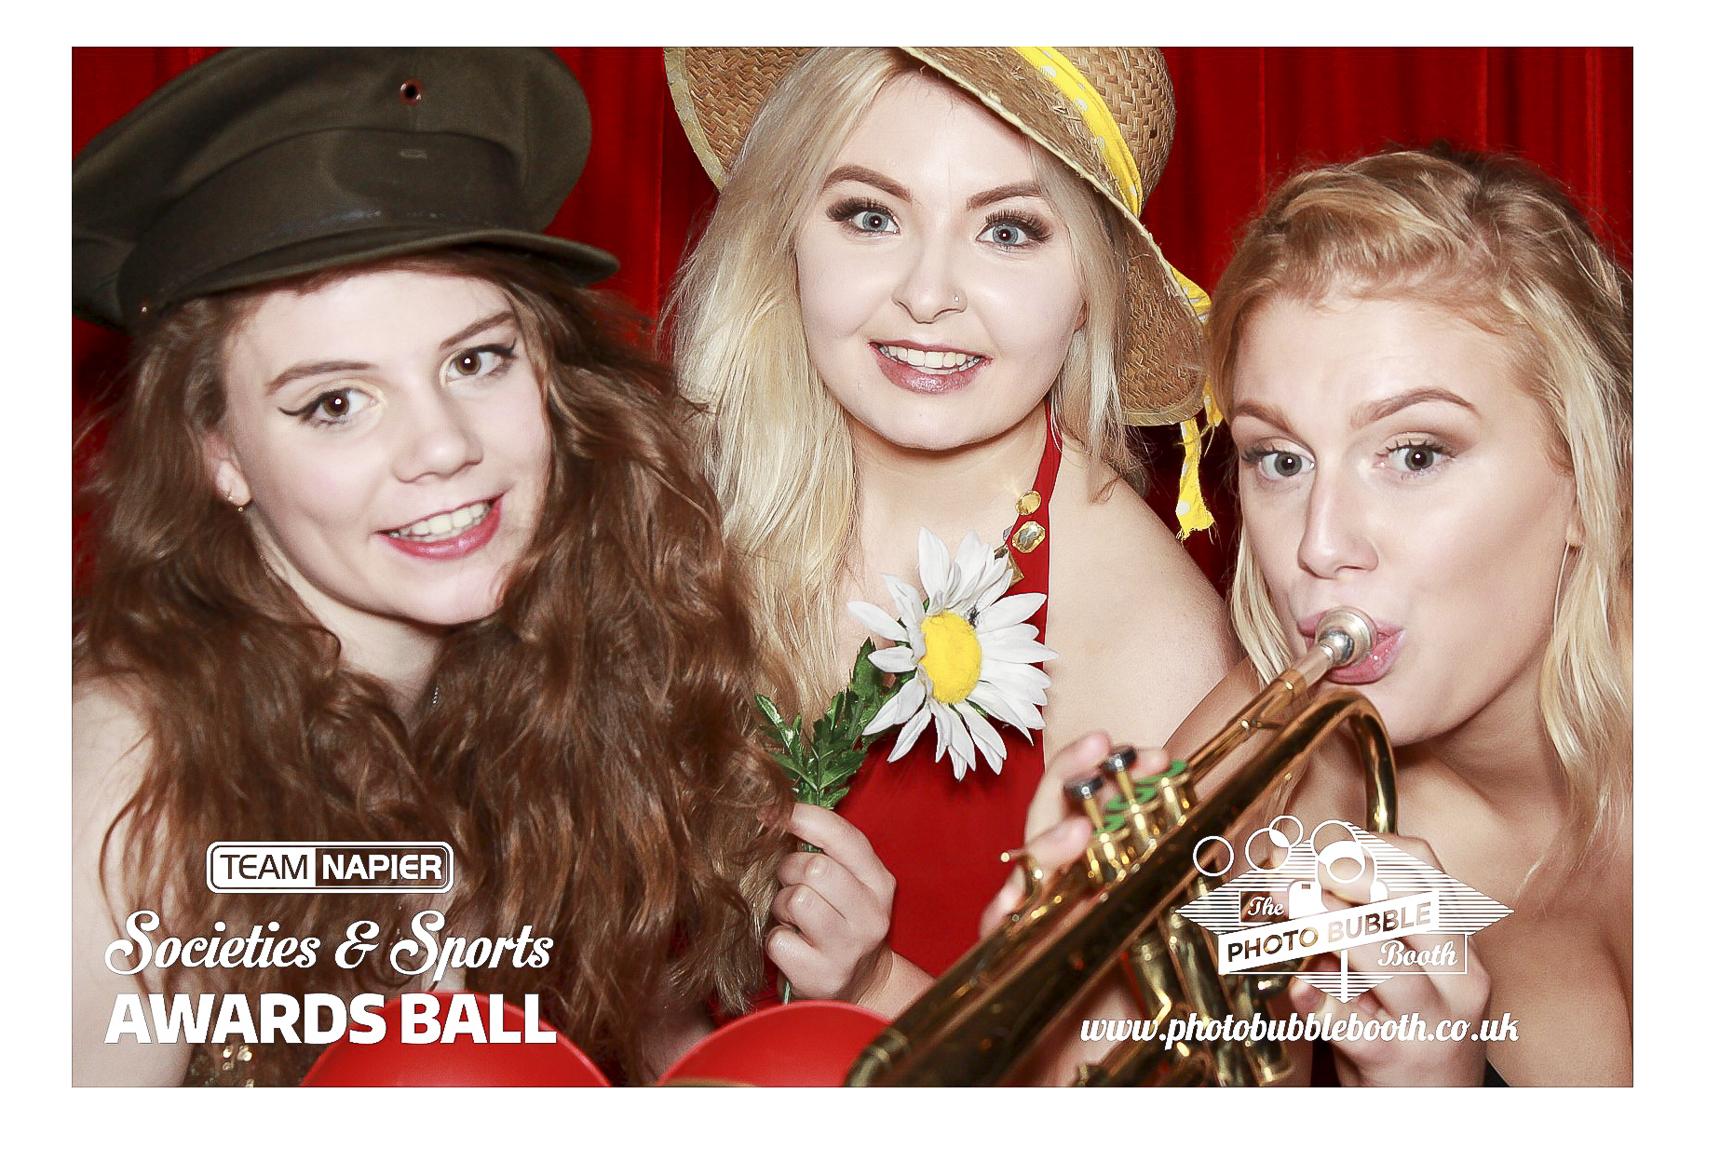 Napier Societies & Sports Awards.JPG